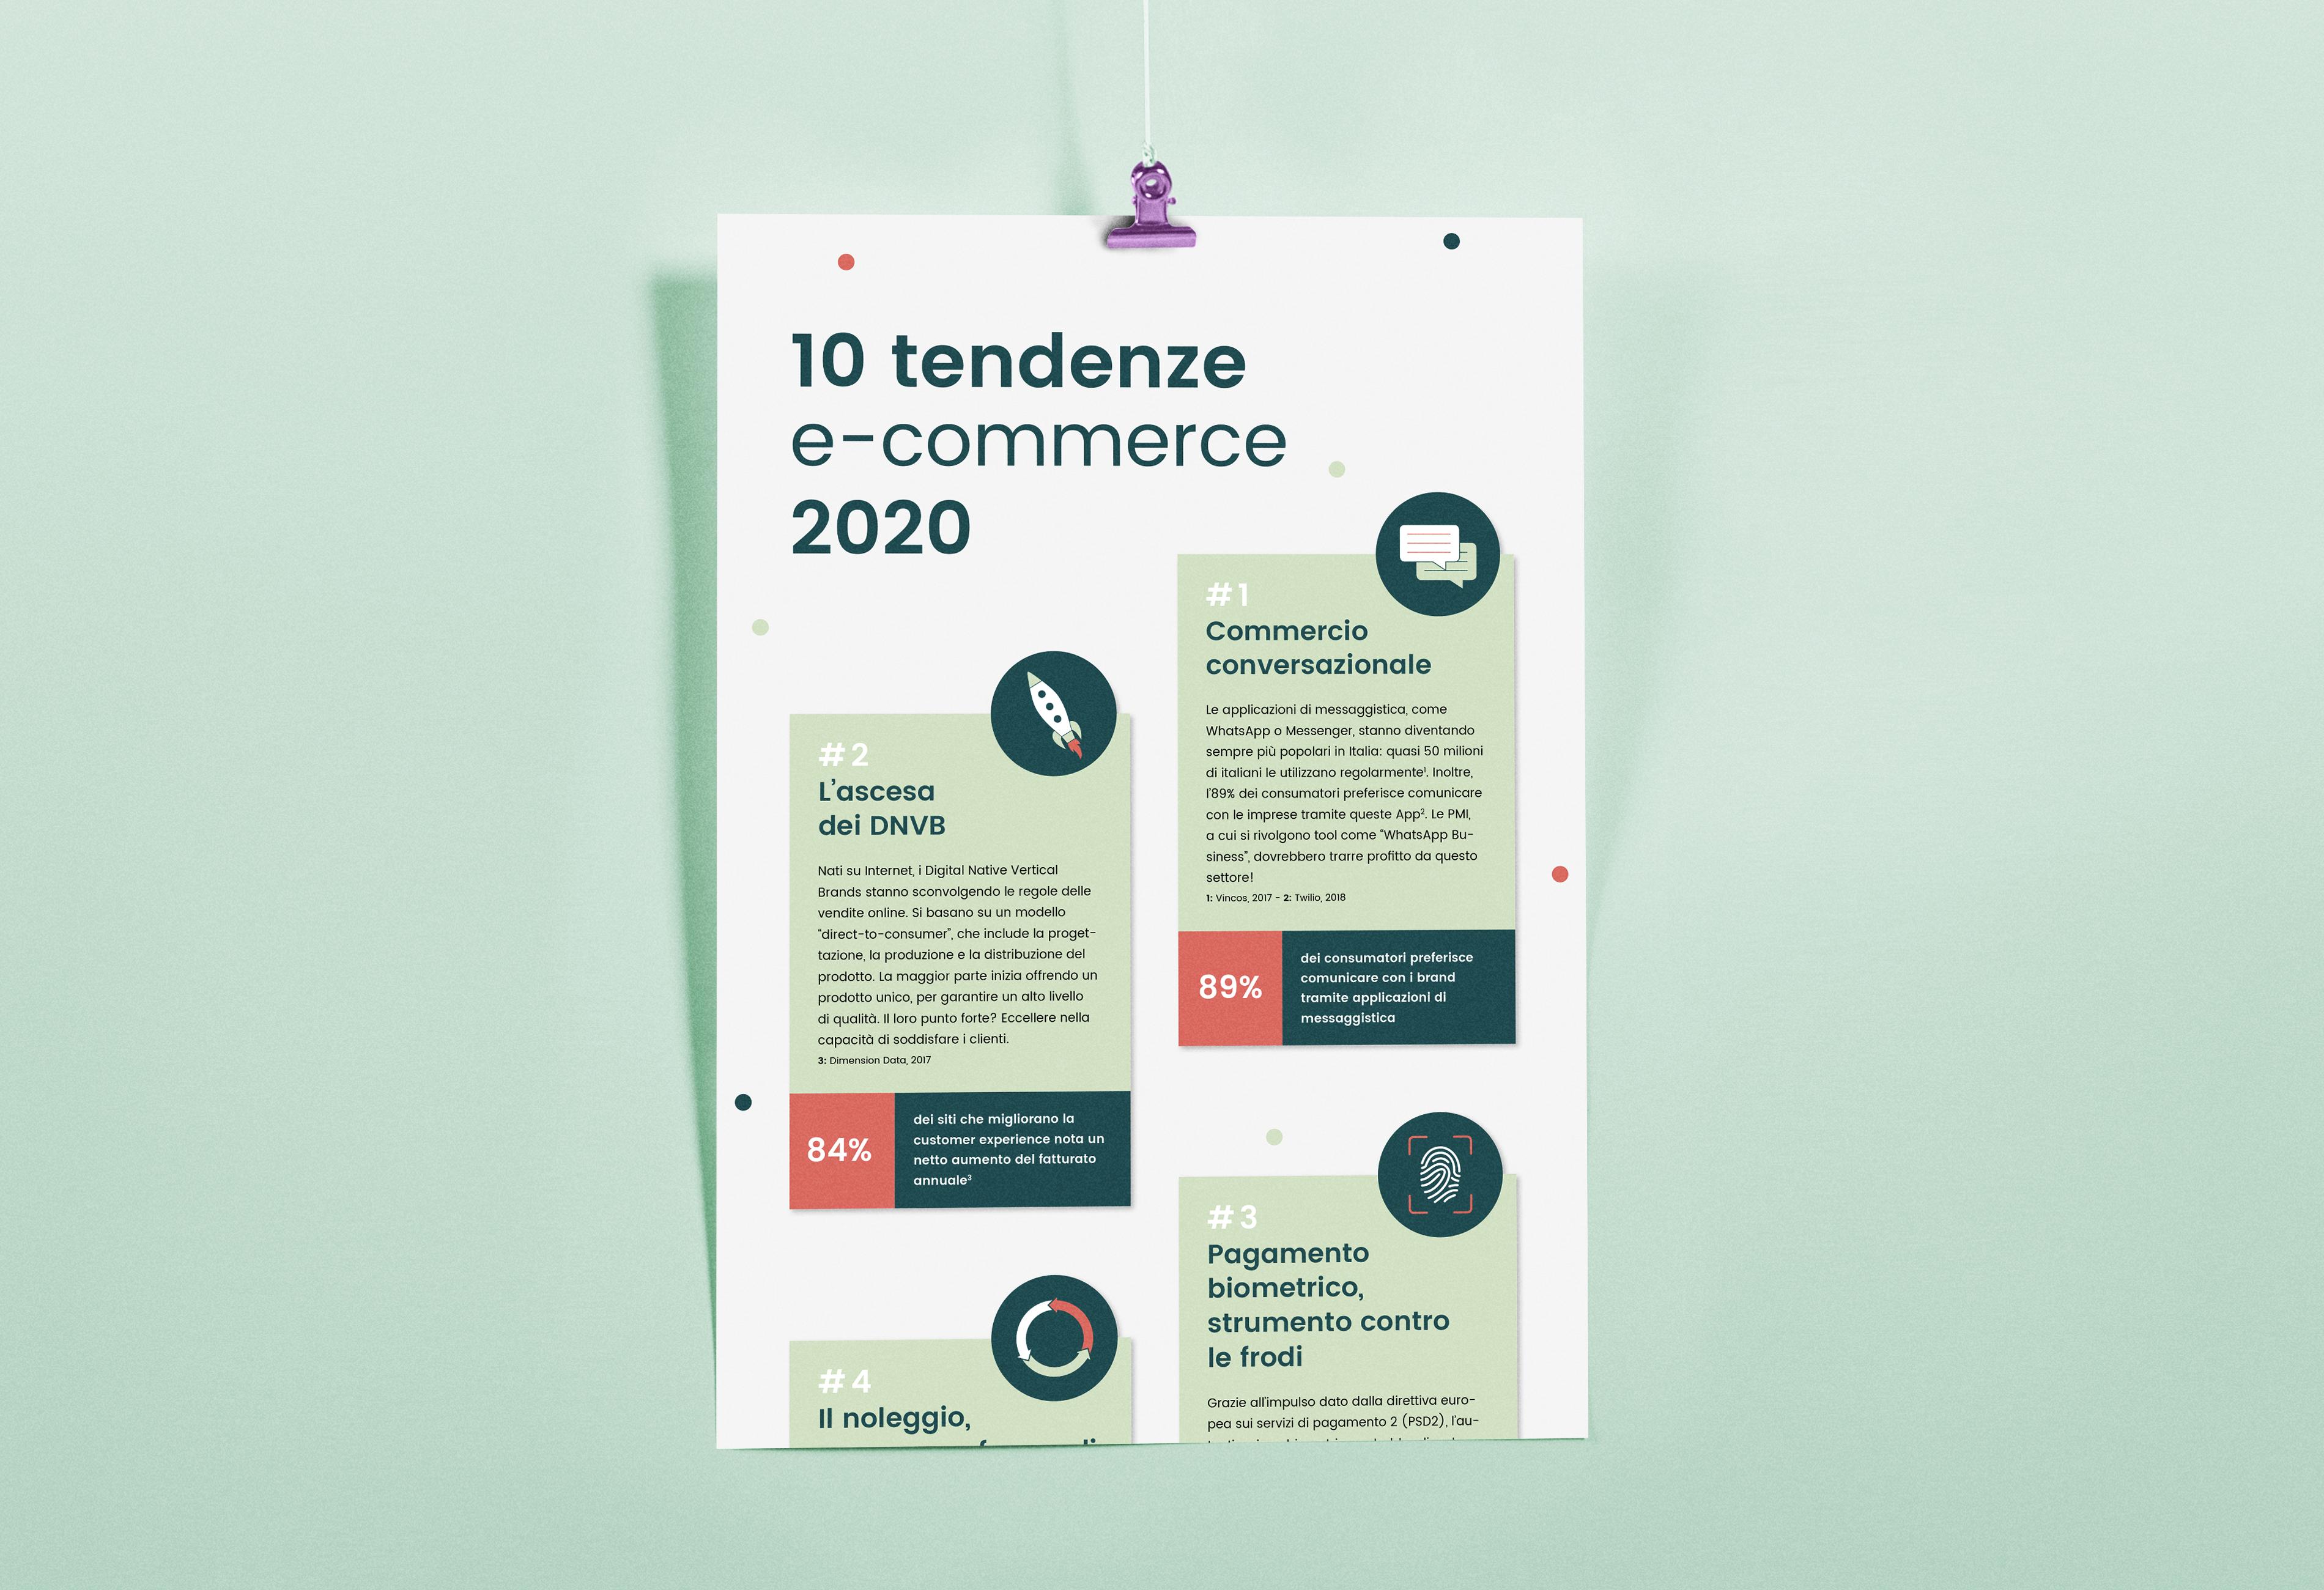 IT_MockUP2_Infographie_10 tendenze e-commerce 2020